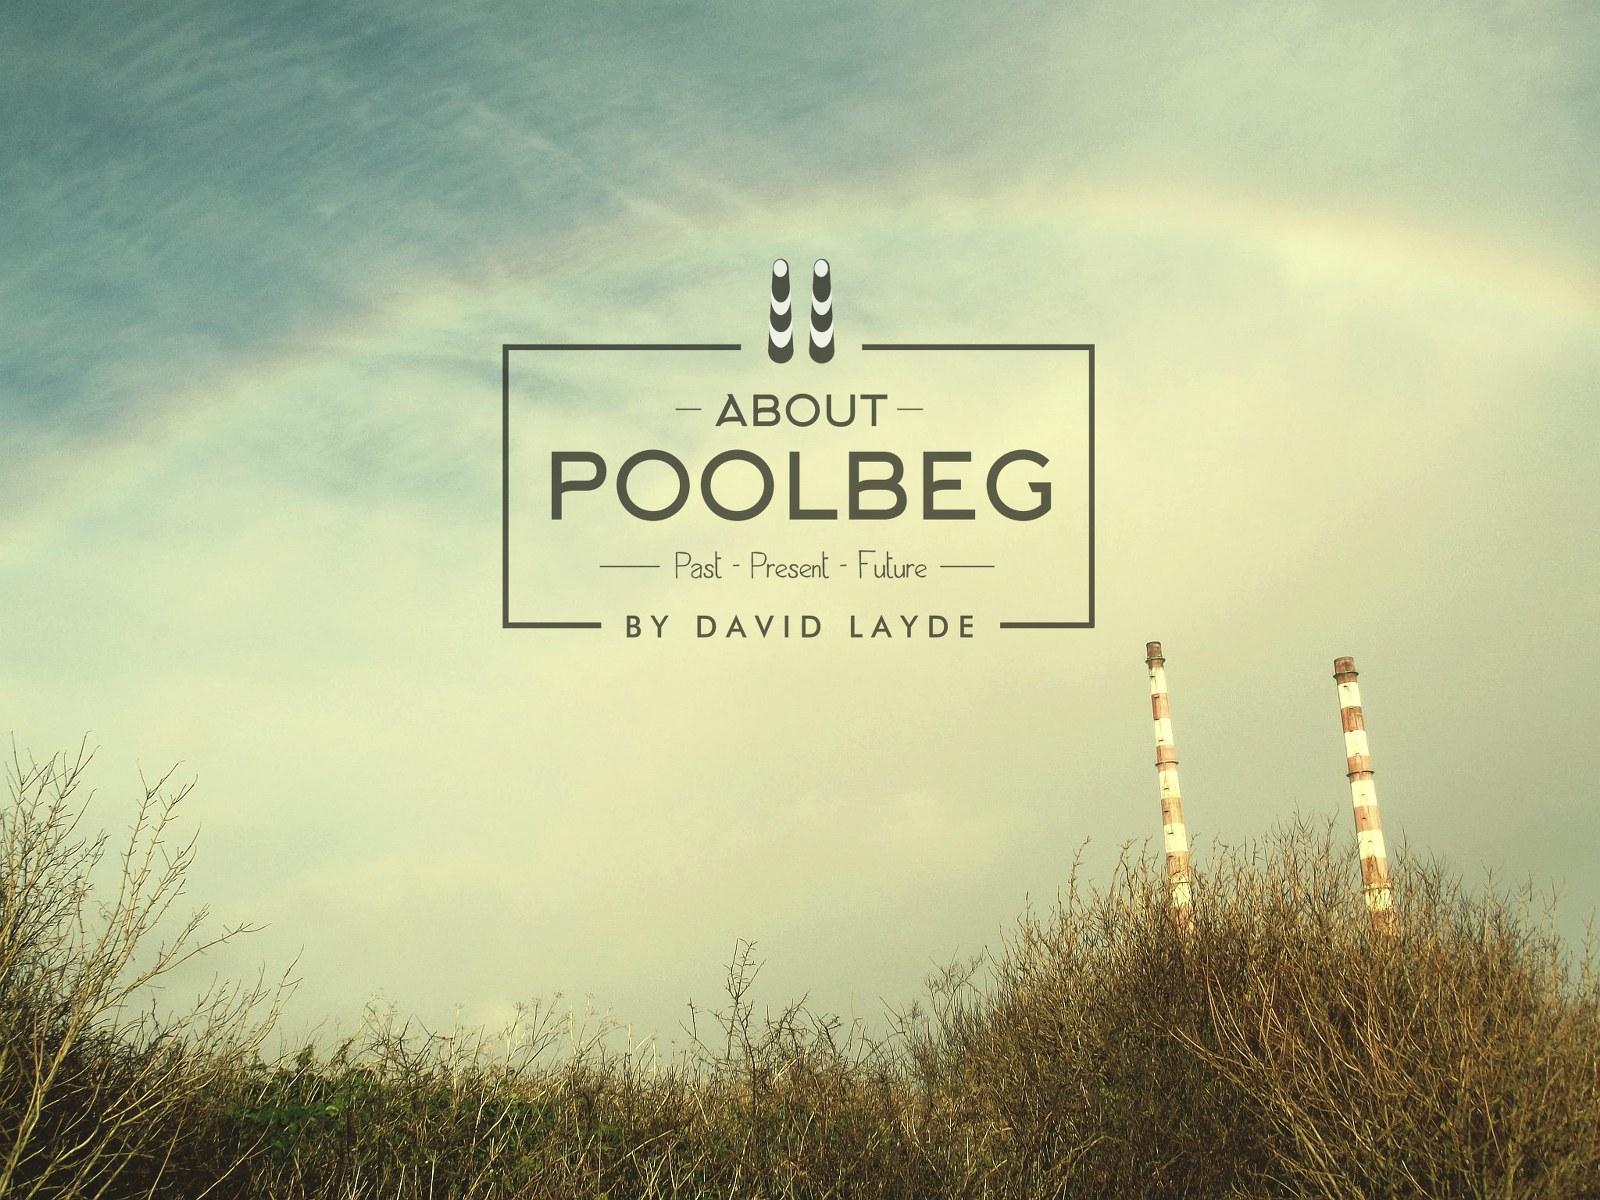 Poolbeg chimneys, Dublin design